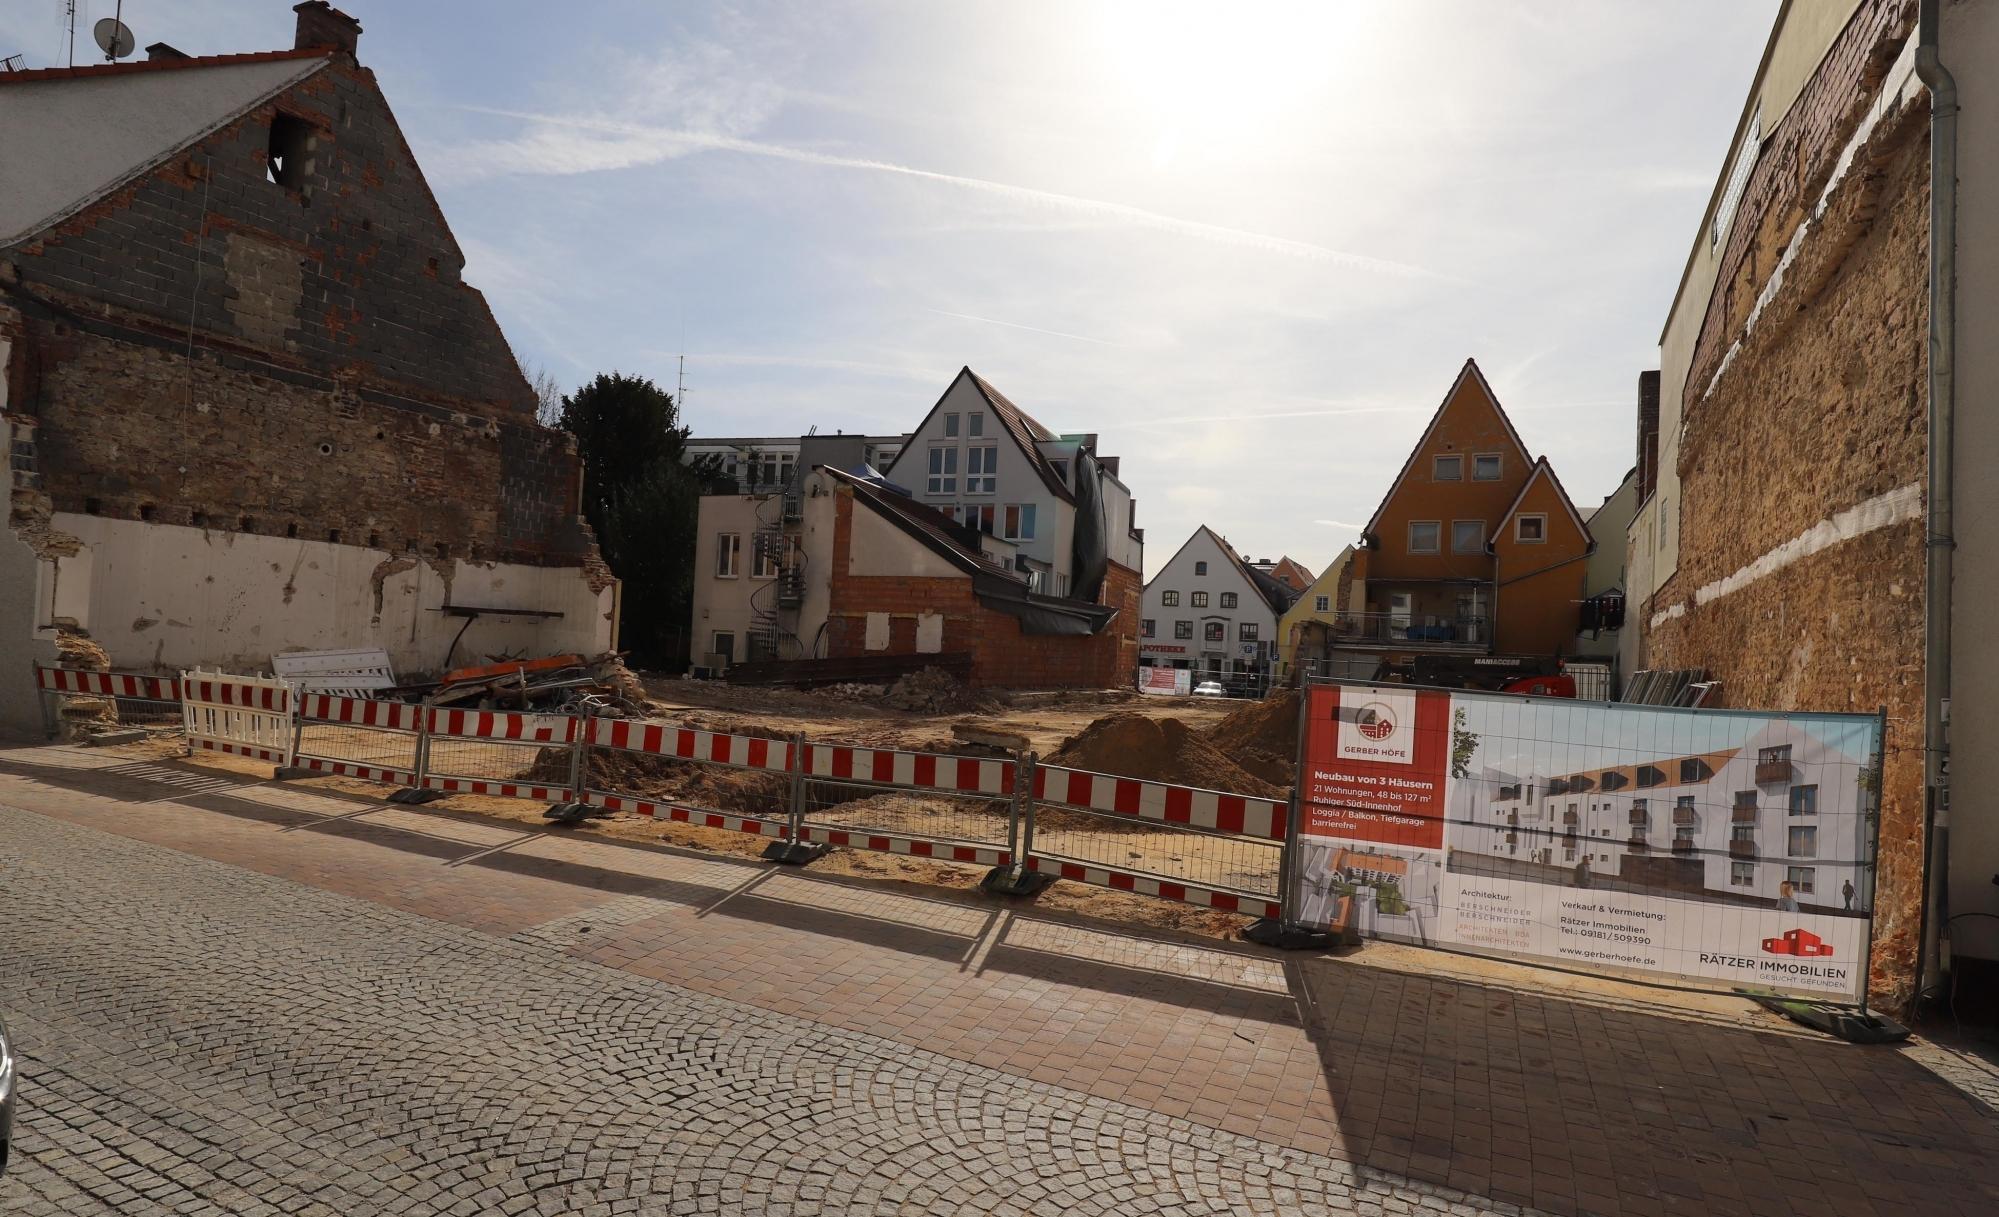 03.04.18 Blick Richtung Marktstraße